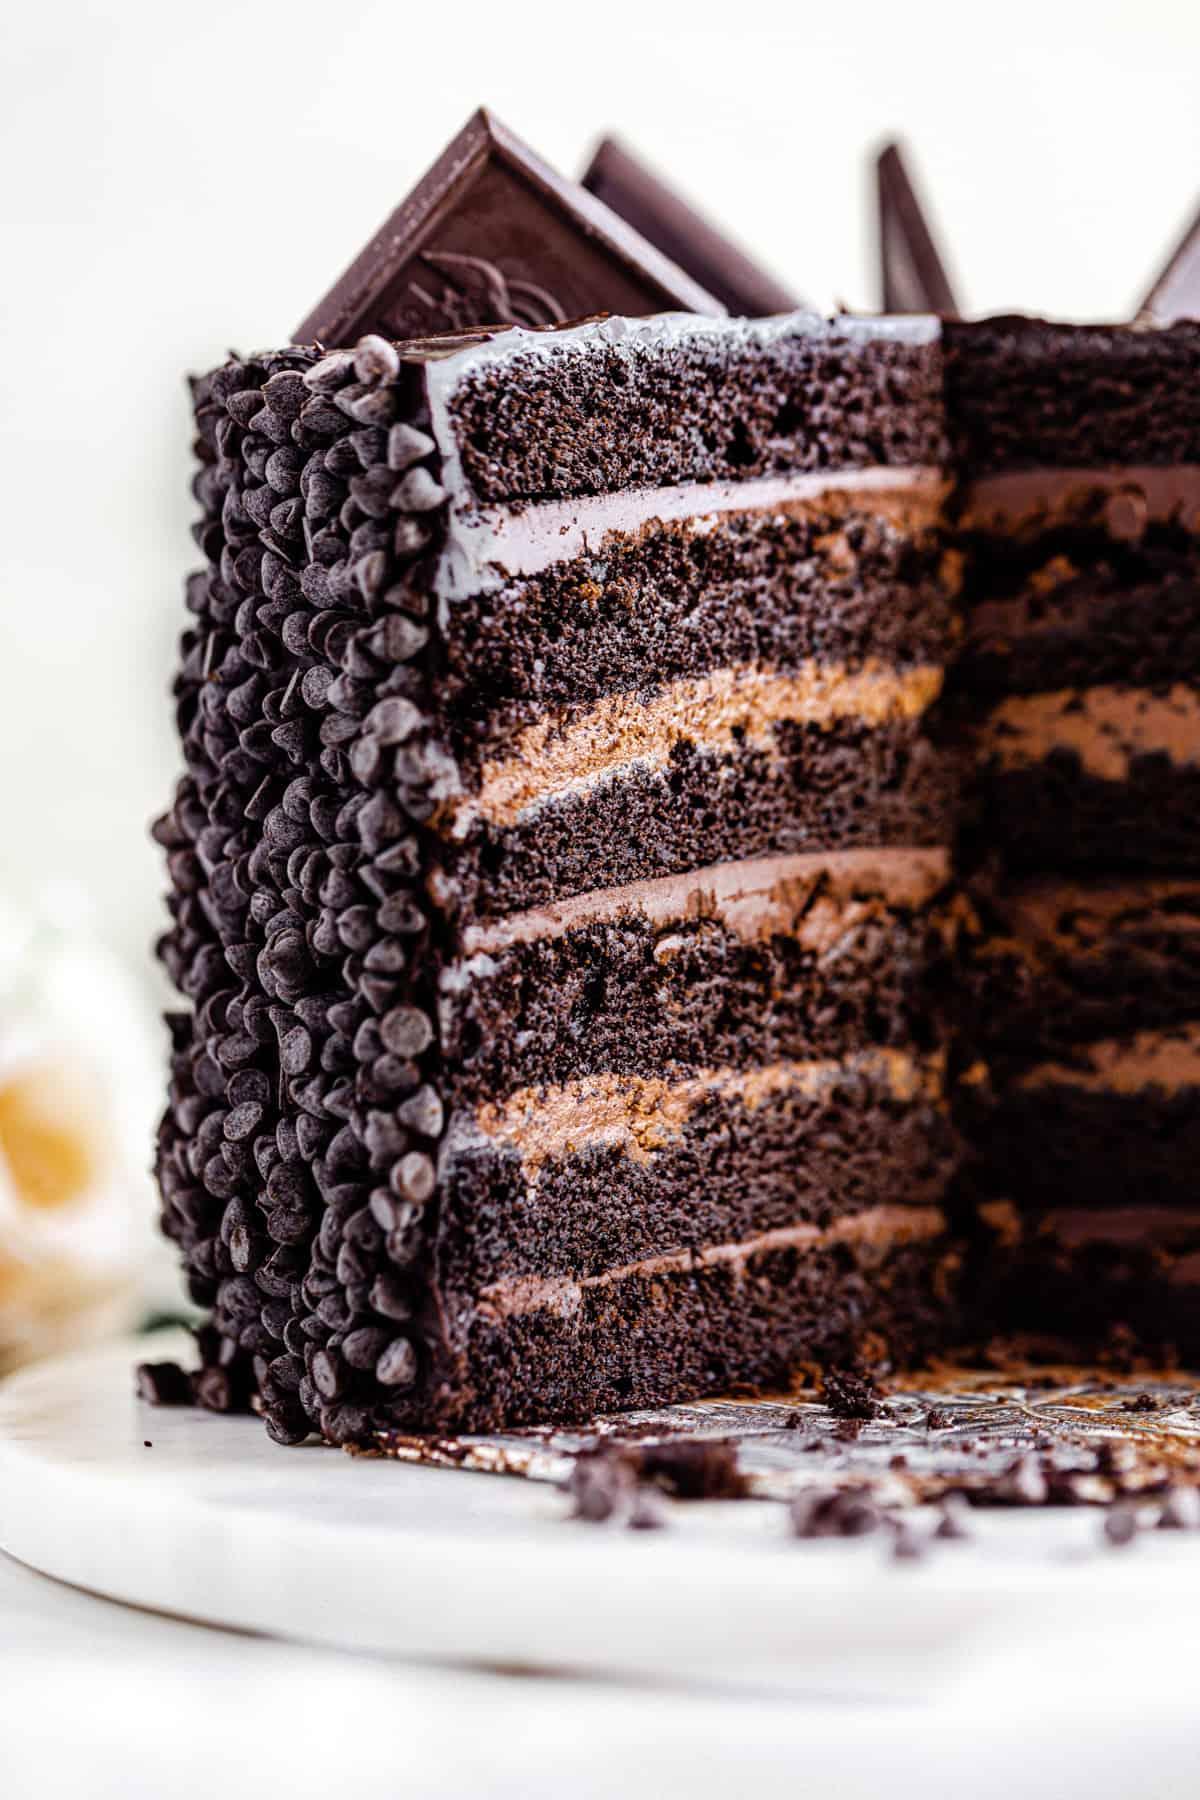 sliced open chocolate cake on a cake board